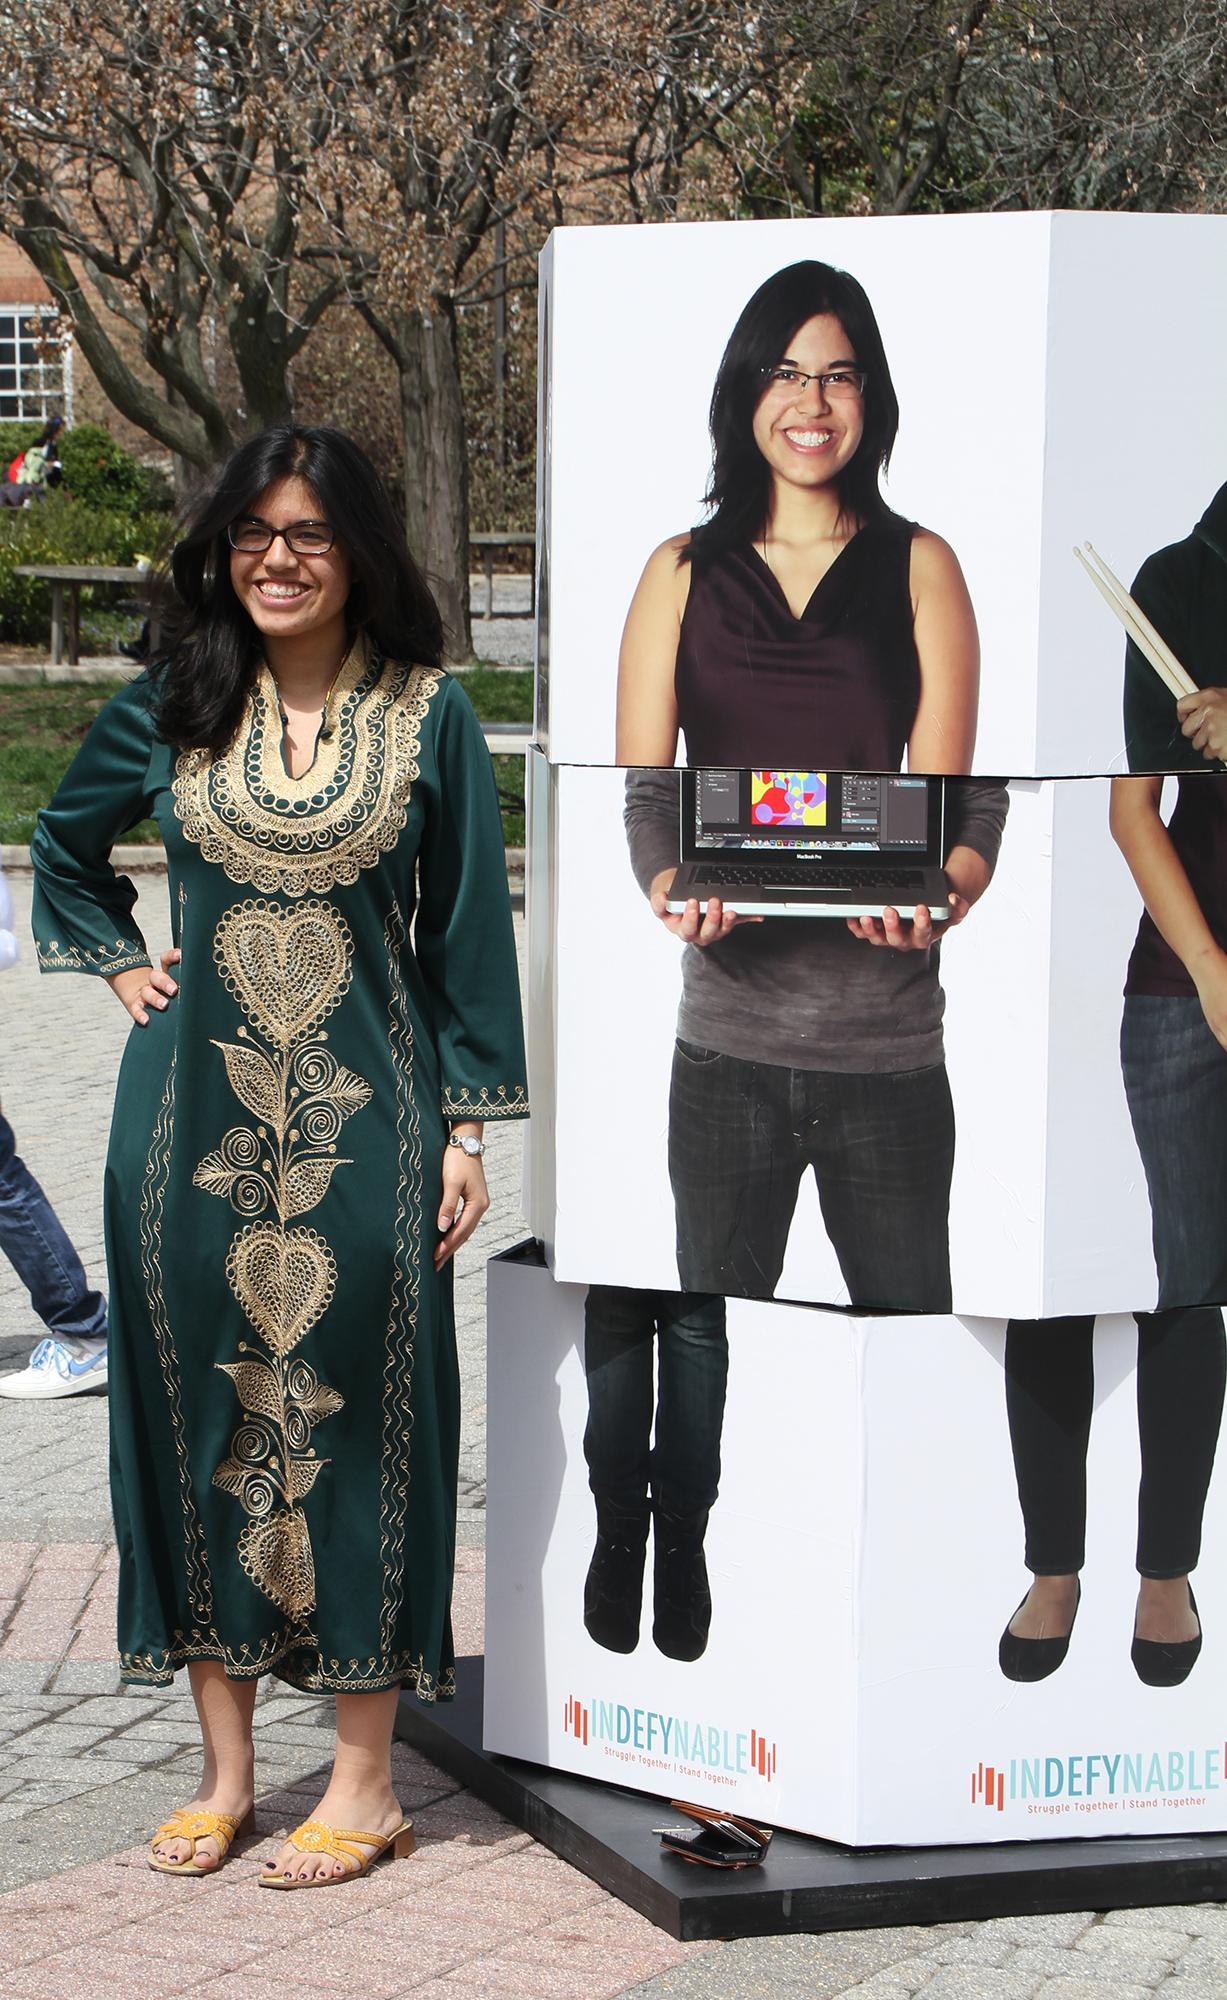 APA student beside her image on the pillar